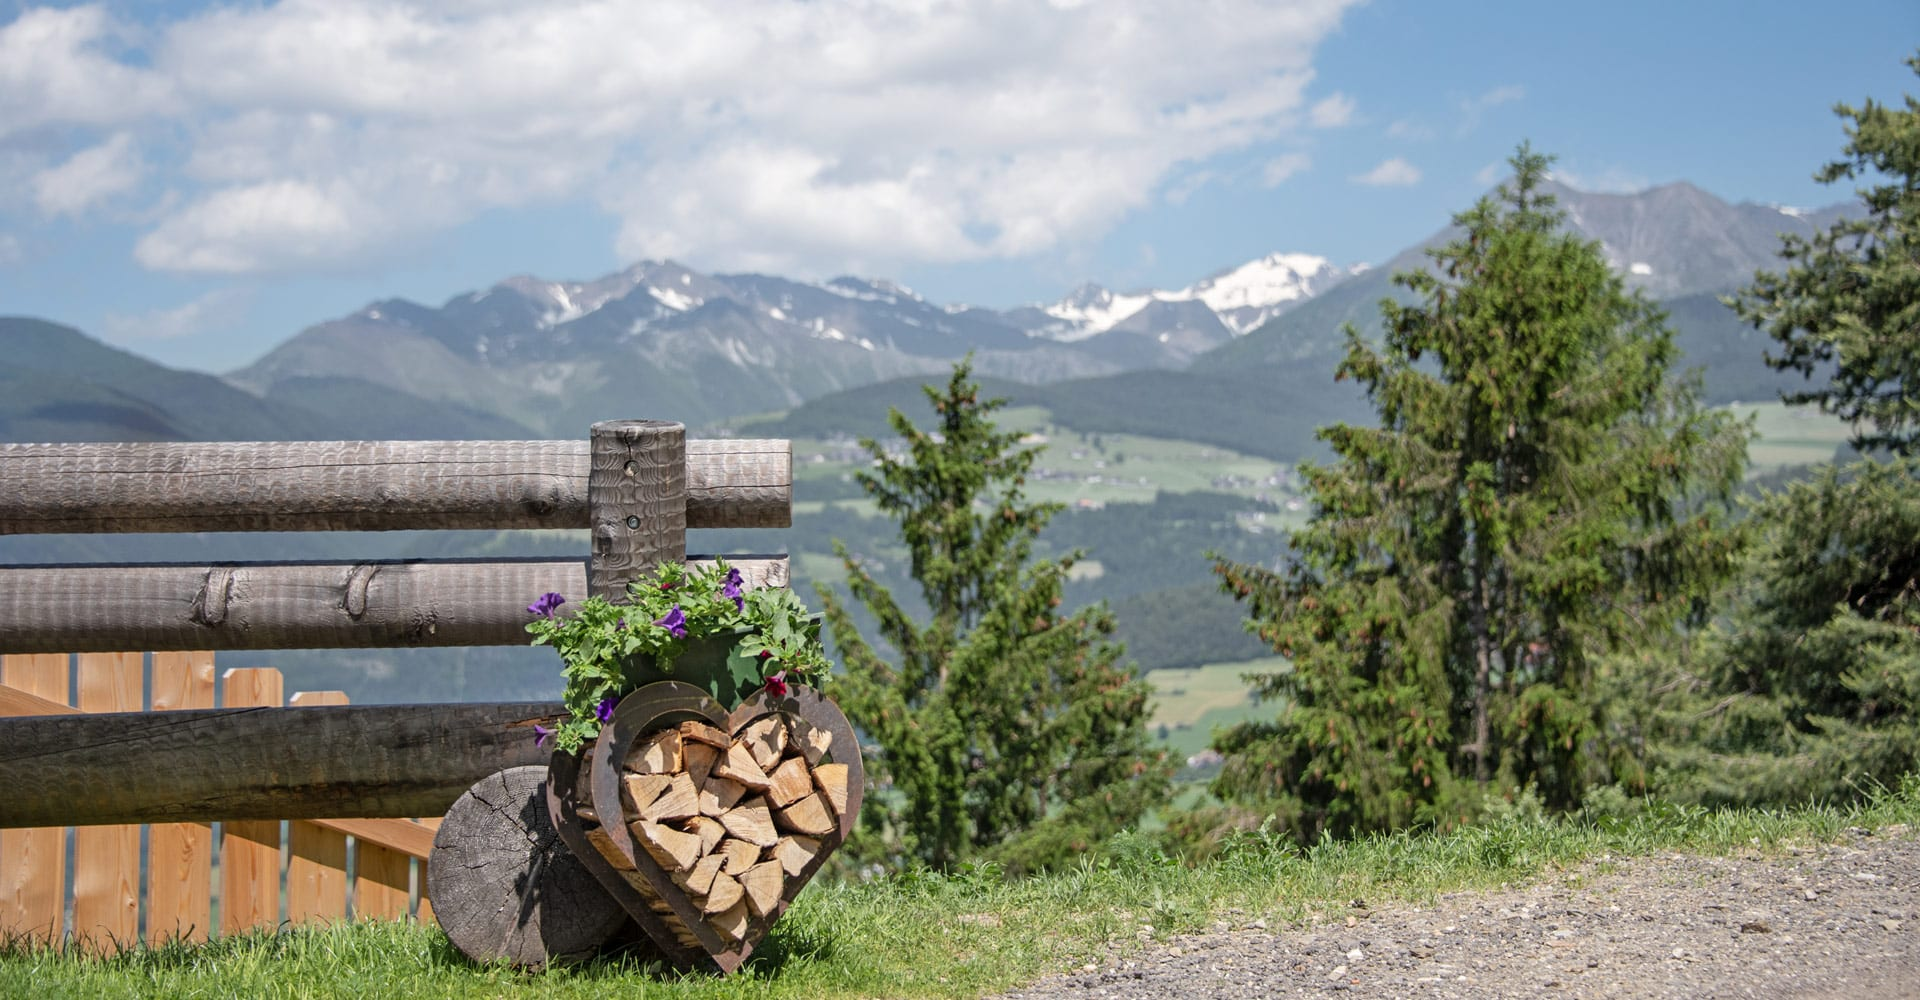 urlaub-am-bergbauernhof-suedtirol